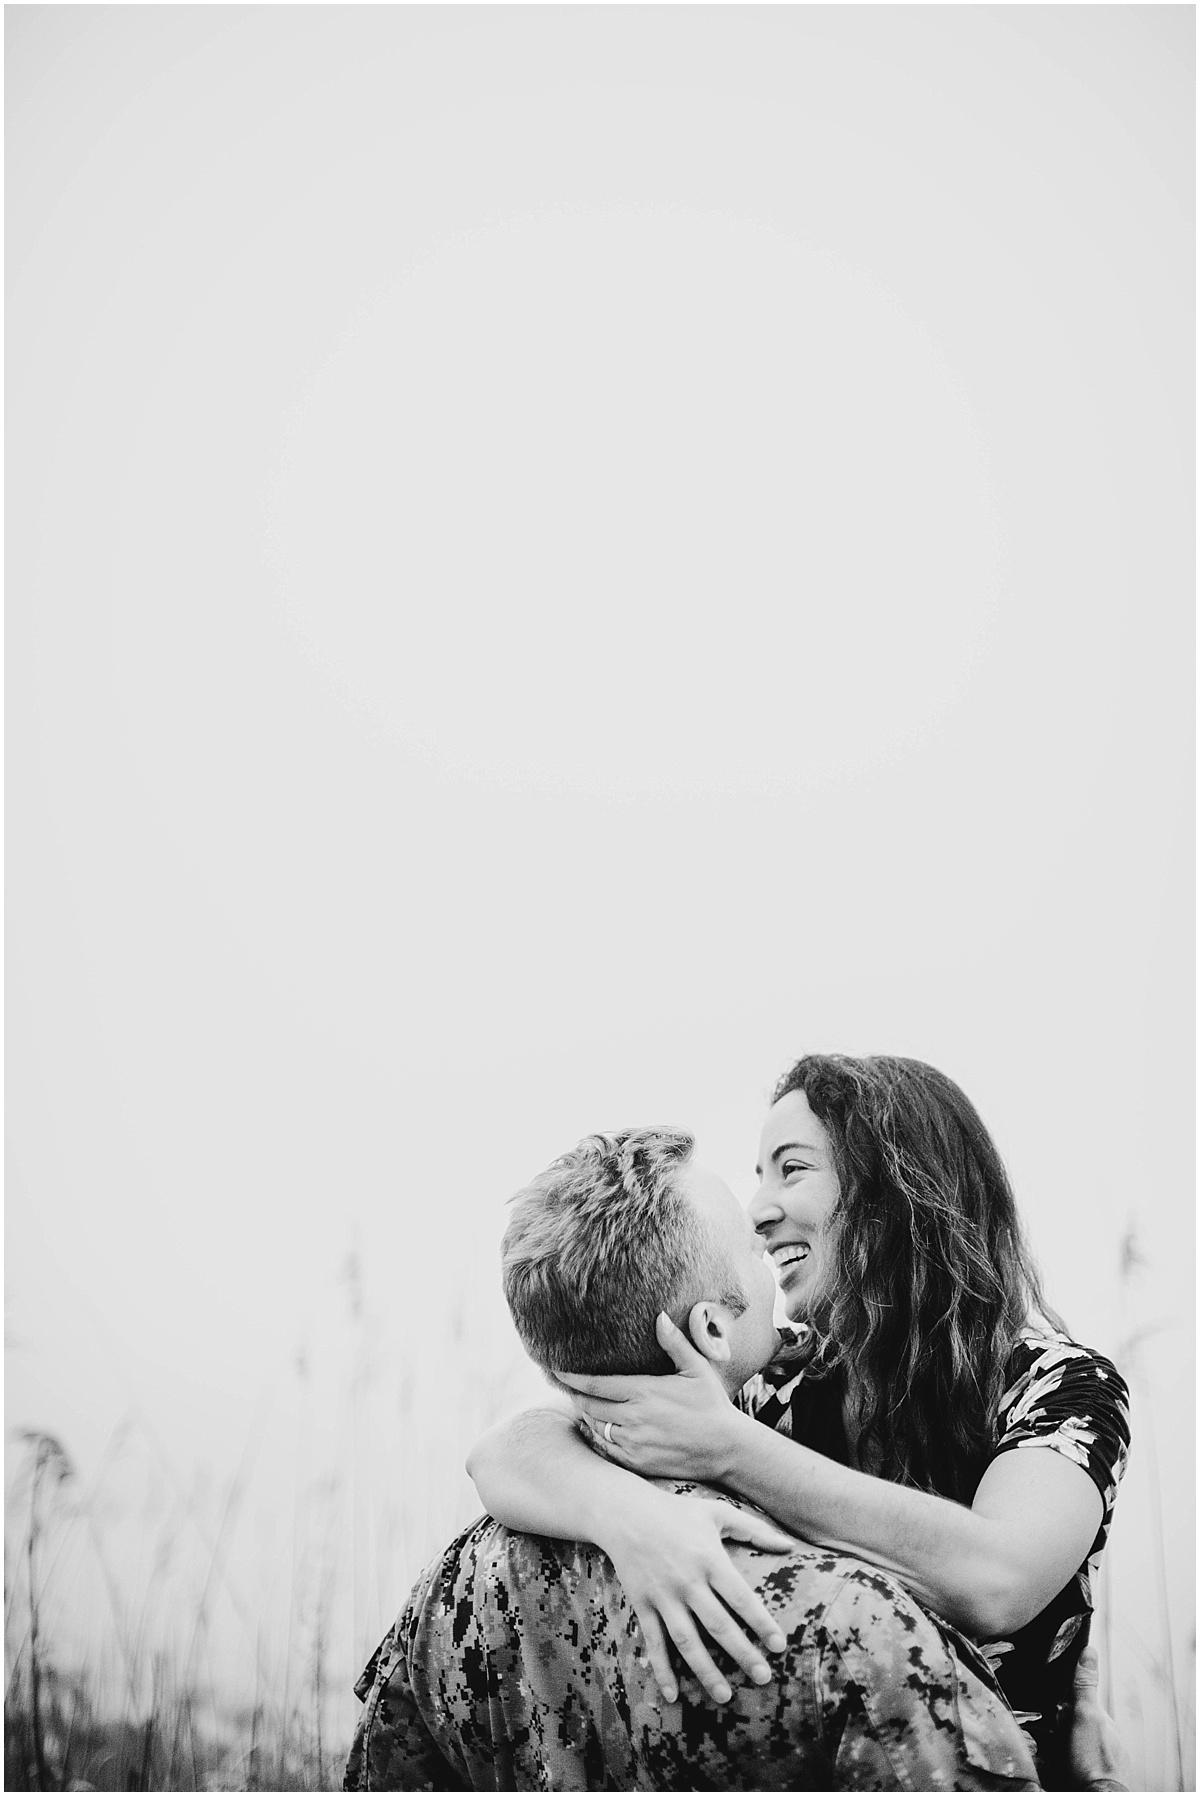 Cora Jane Photography - wedding photographer - new england wedding - mystic connecticut_0248.jpg